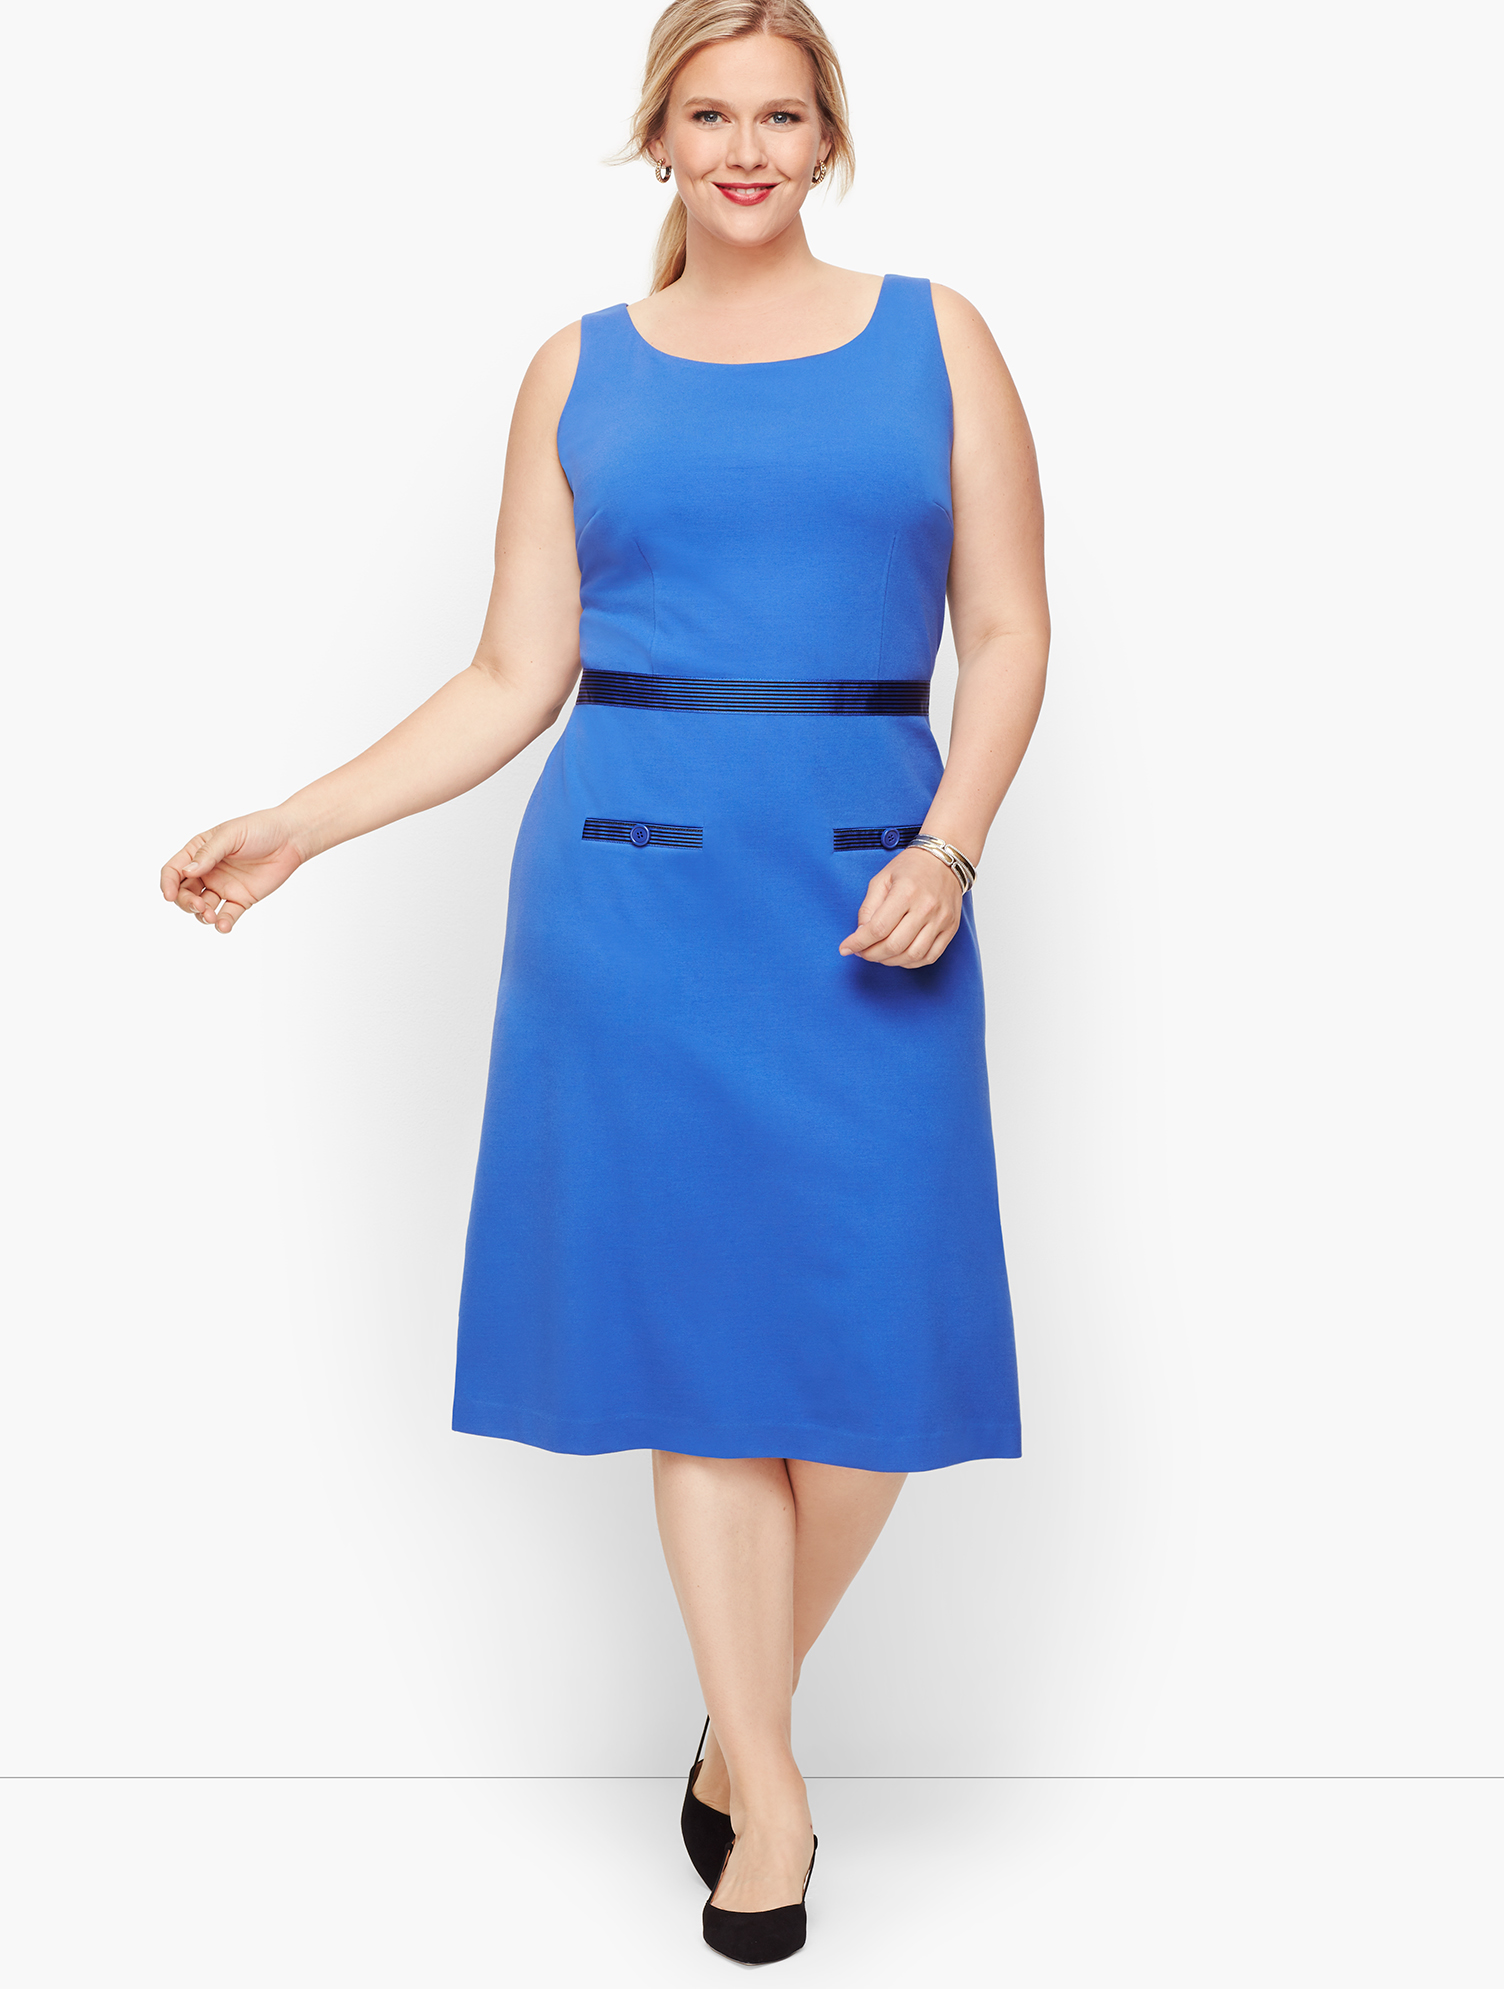 60s 70s Plus Size Dresses, Clothing, Costumes Ponte Grosgrain-trim Sheath Dress - Stripe - DEEP-PERIWINKLE - 22 - Talbots $119.99 AT vintagedancer.com